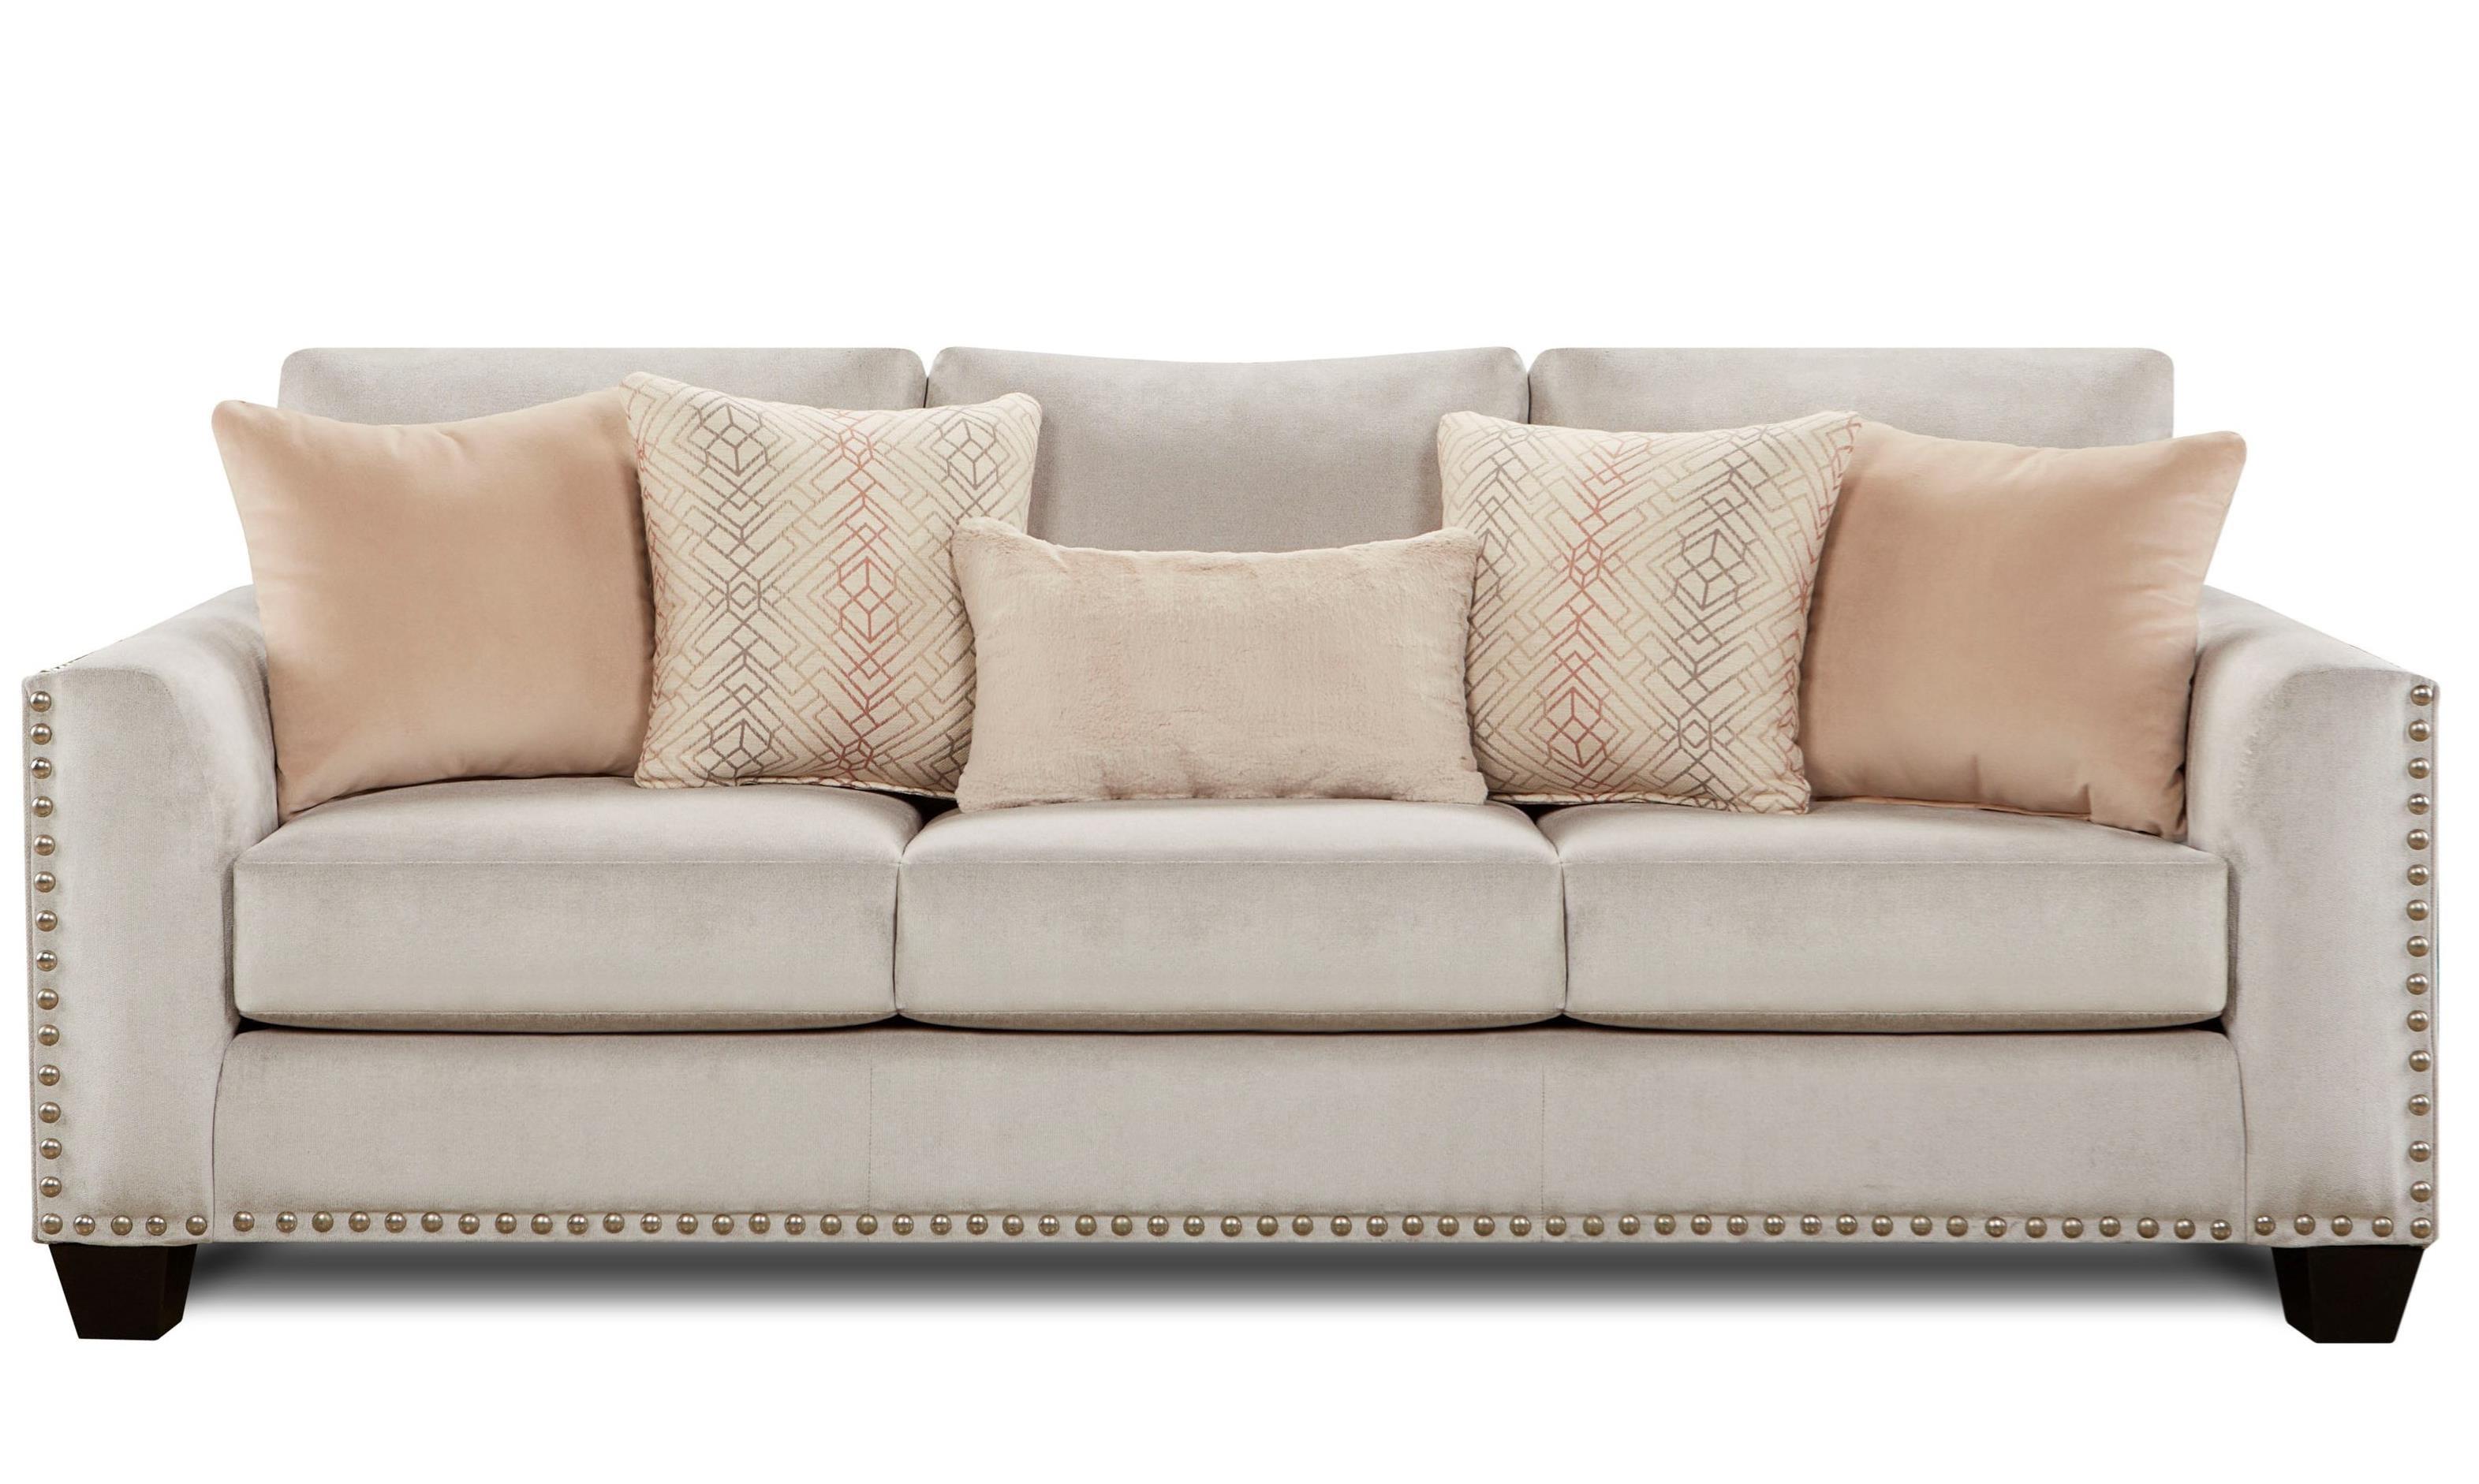 Fusion Furniture 1460 Sofa - Item Number: 1460-KPAsia Fawn Brindle